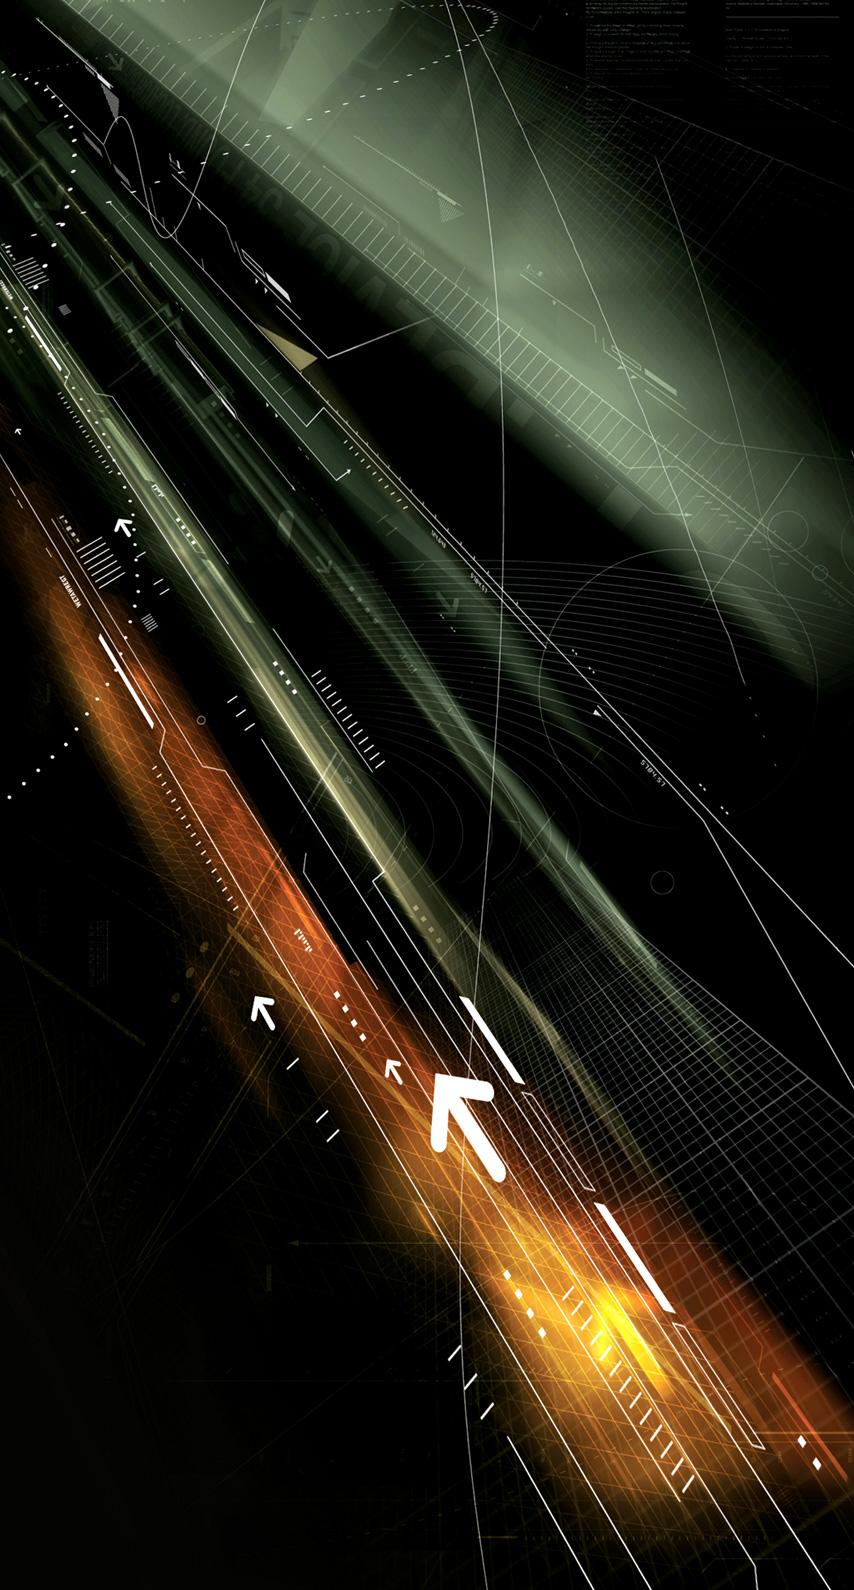 light, graphic